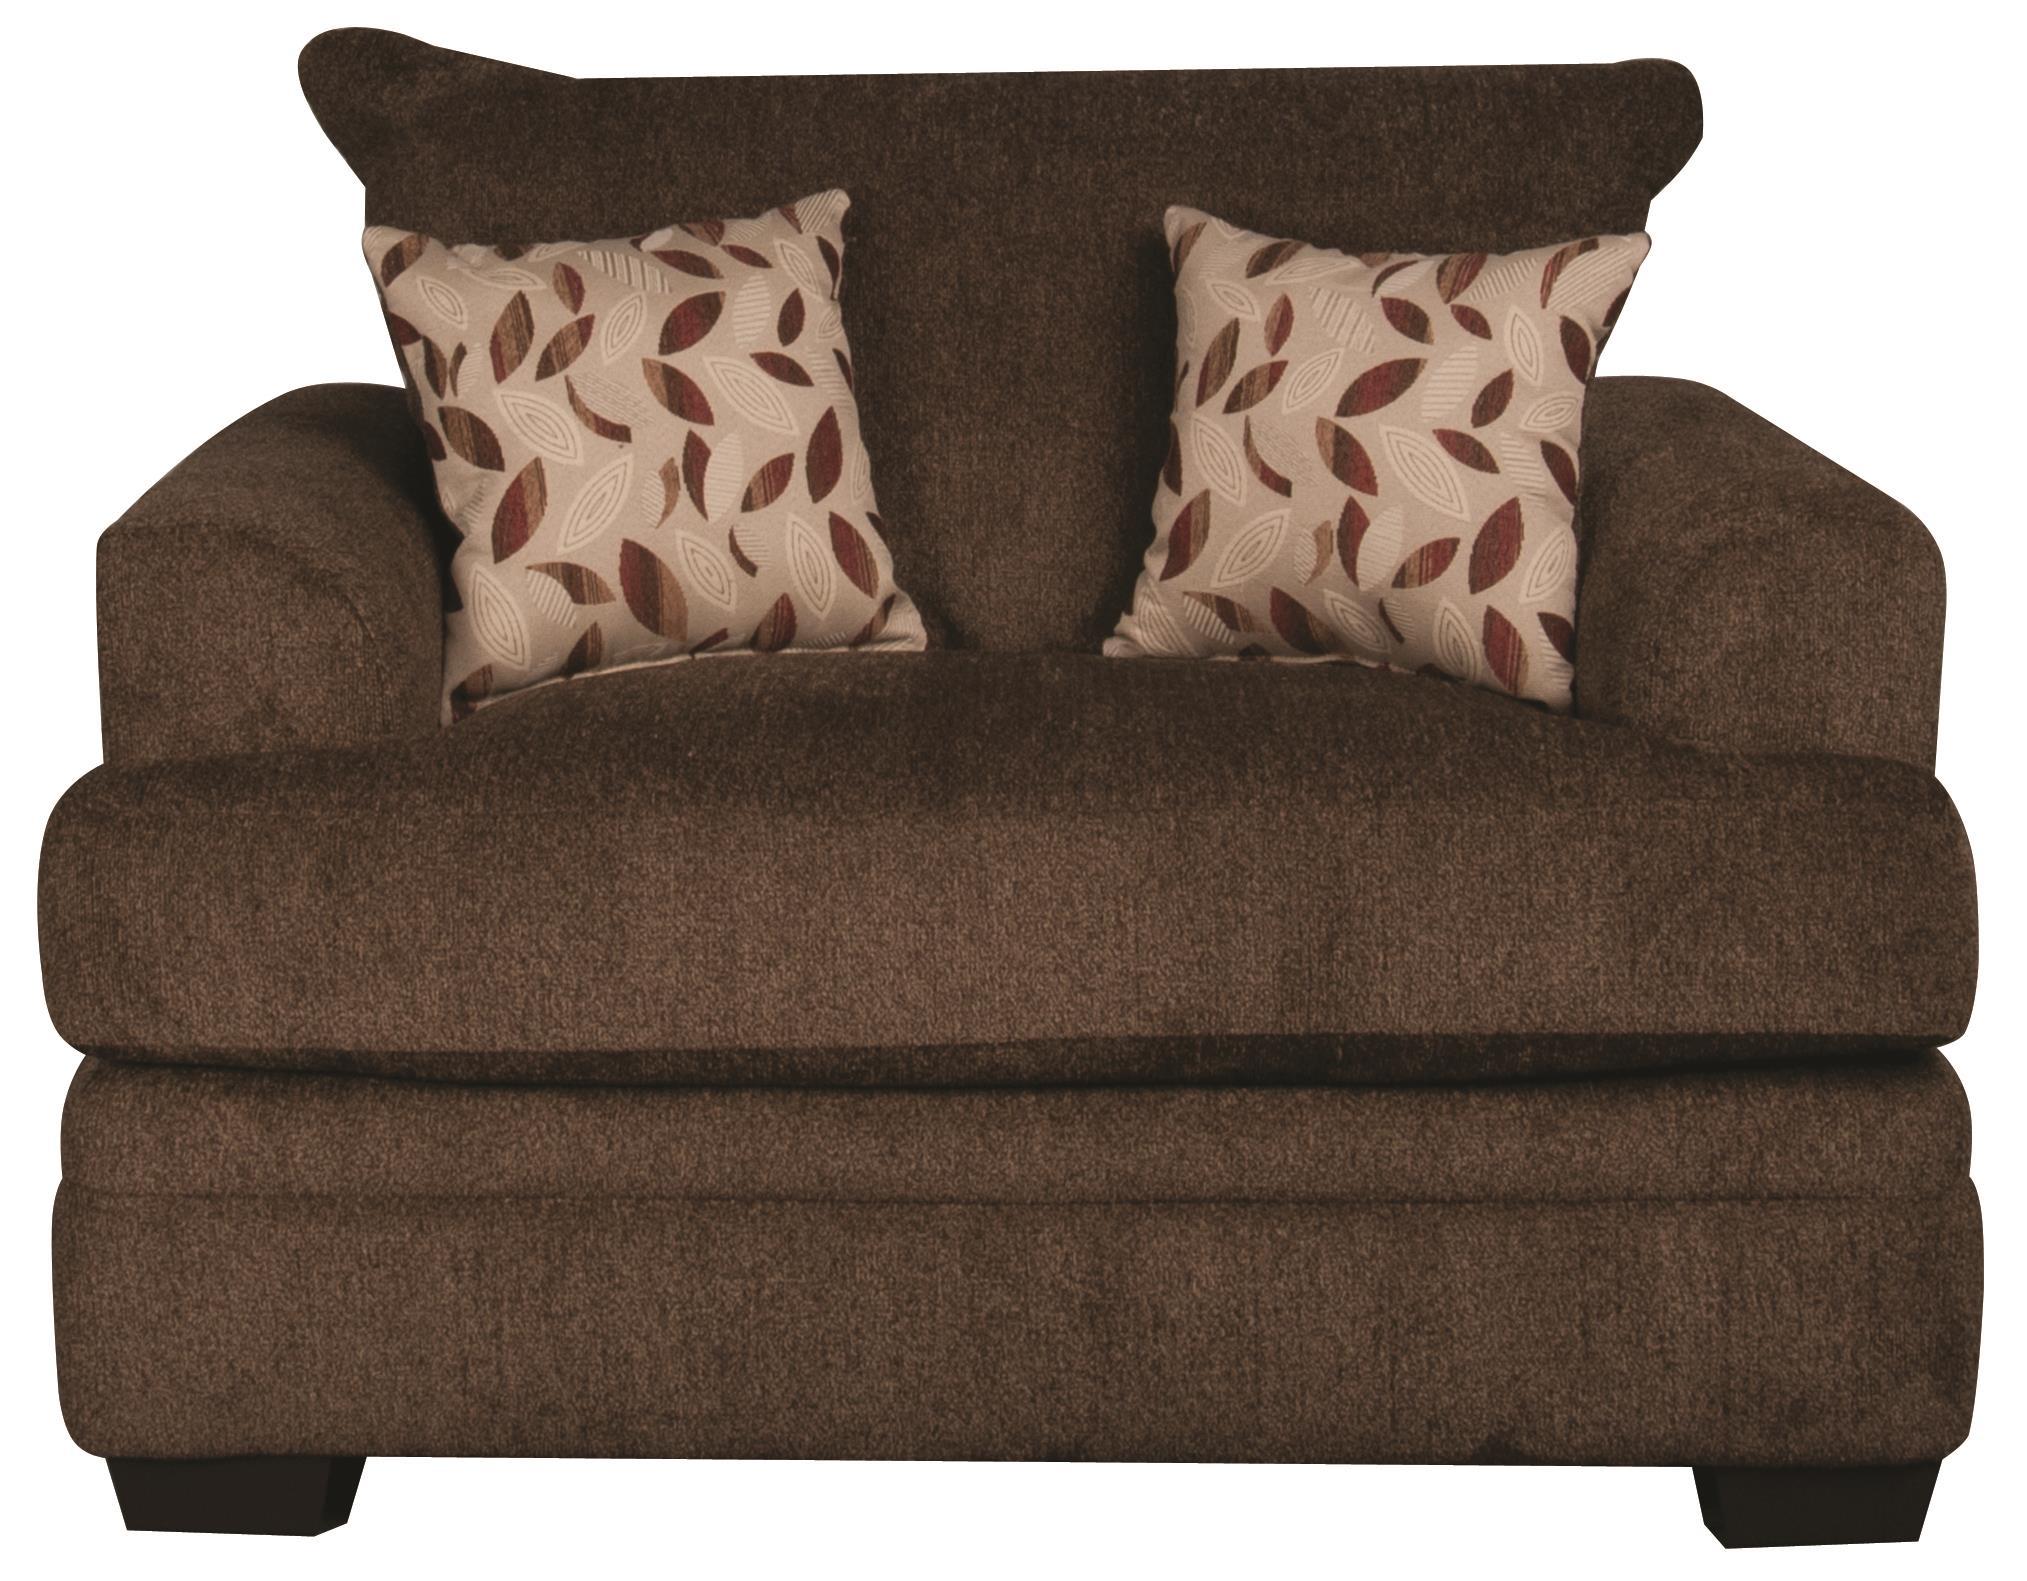 Morris Home Furnishings Eva Eva Chair and a Half - Item Number: 972217754